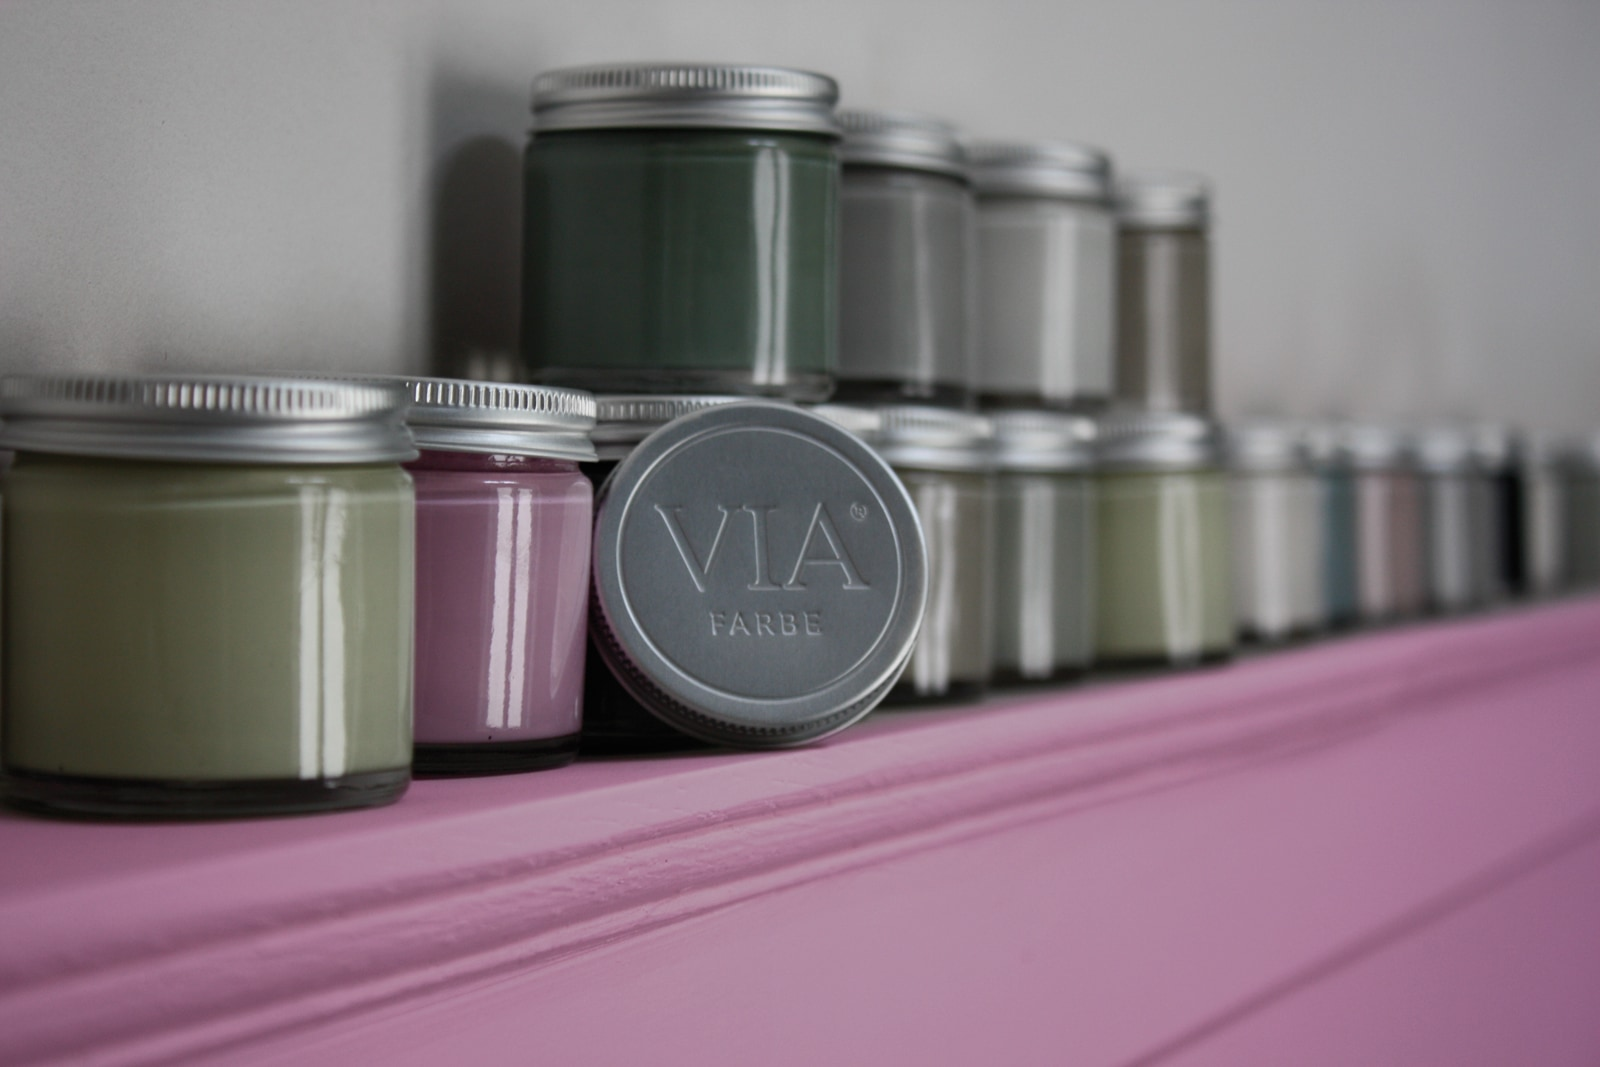 VIA-Kreidefarbe-Gläschen-B